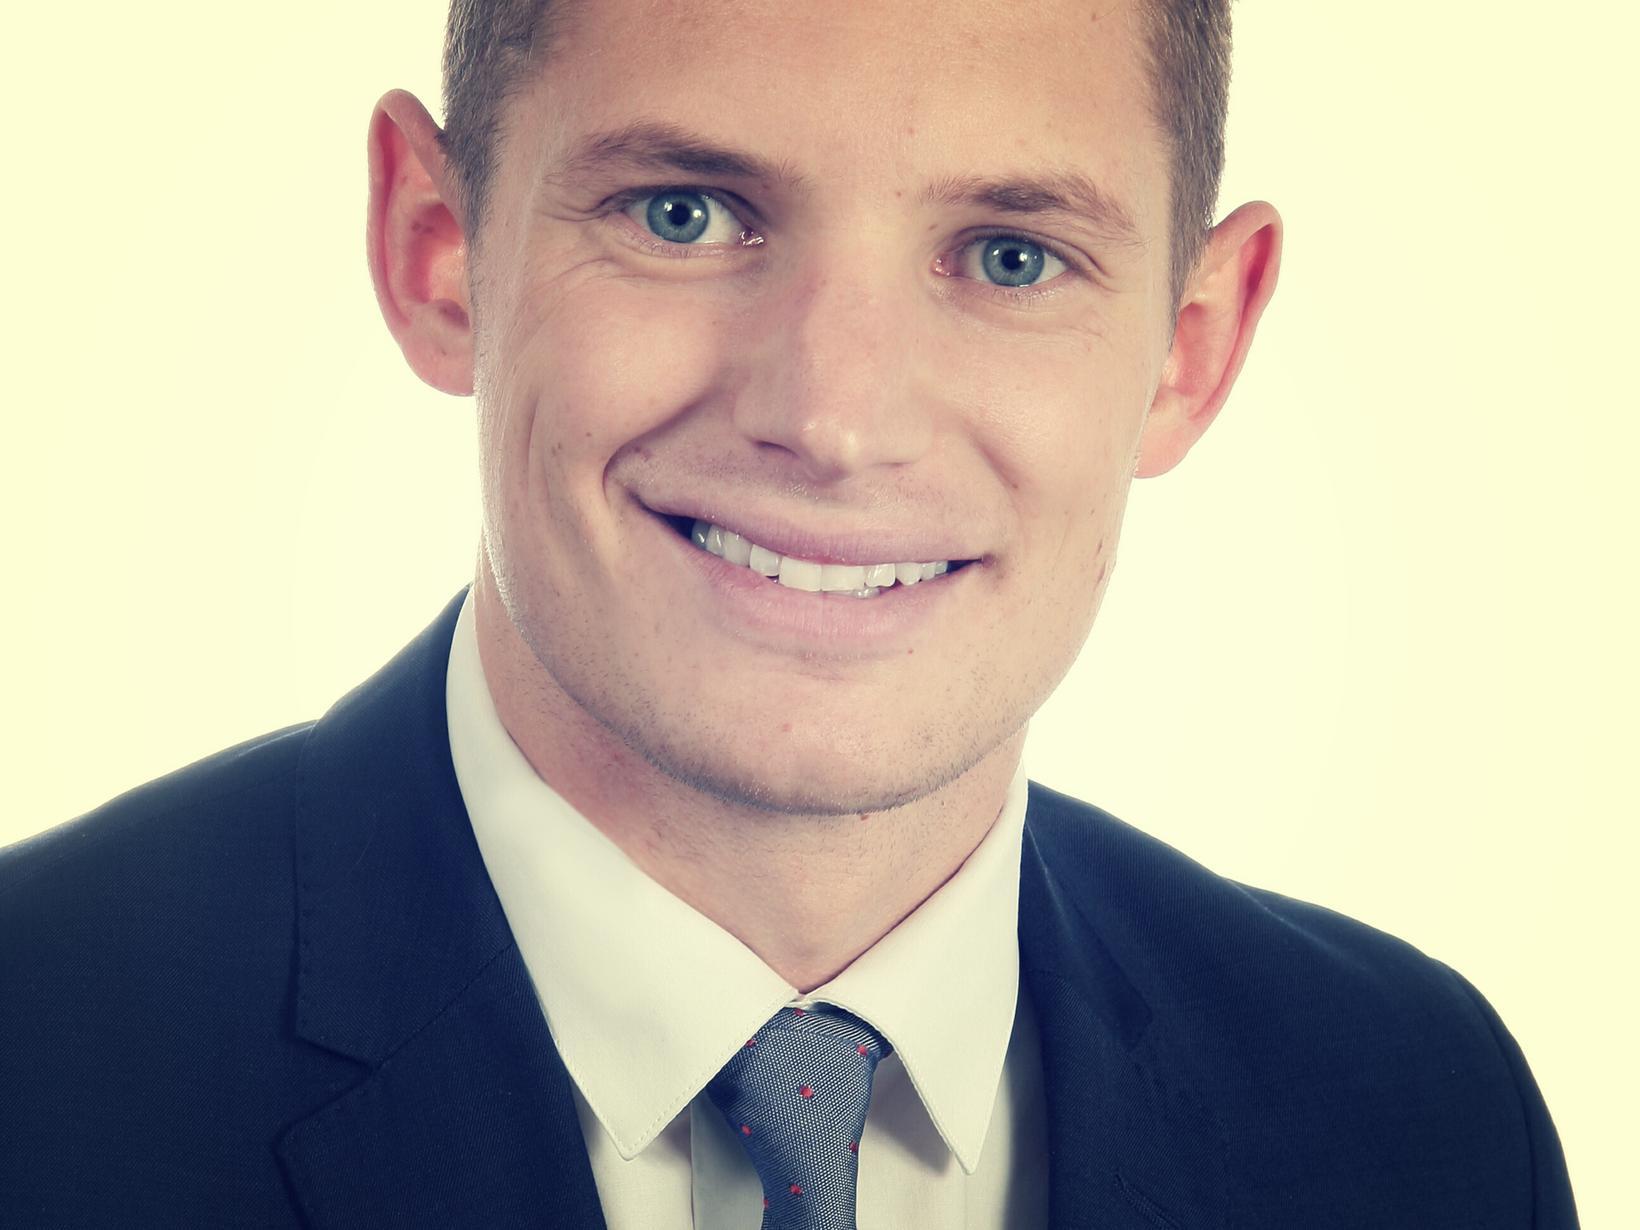 Craig from London, United Kingdom